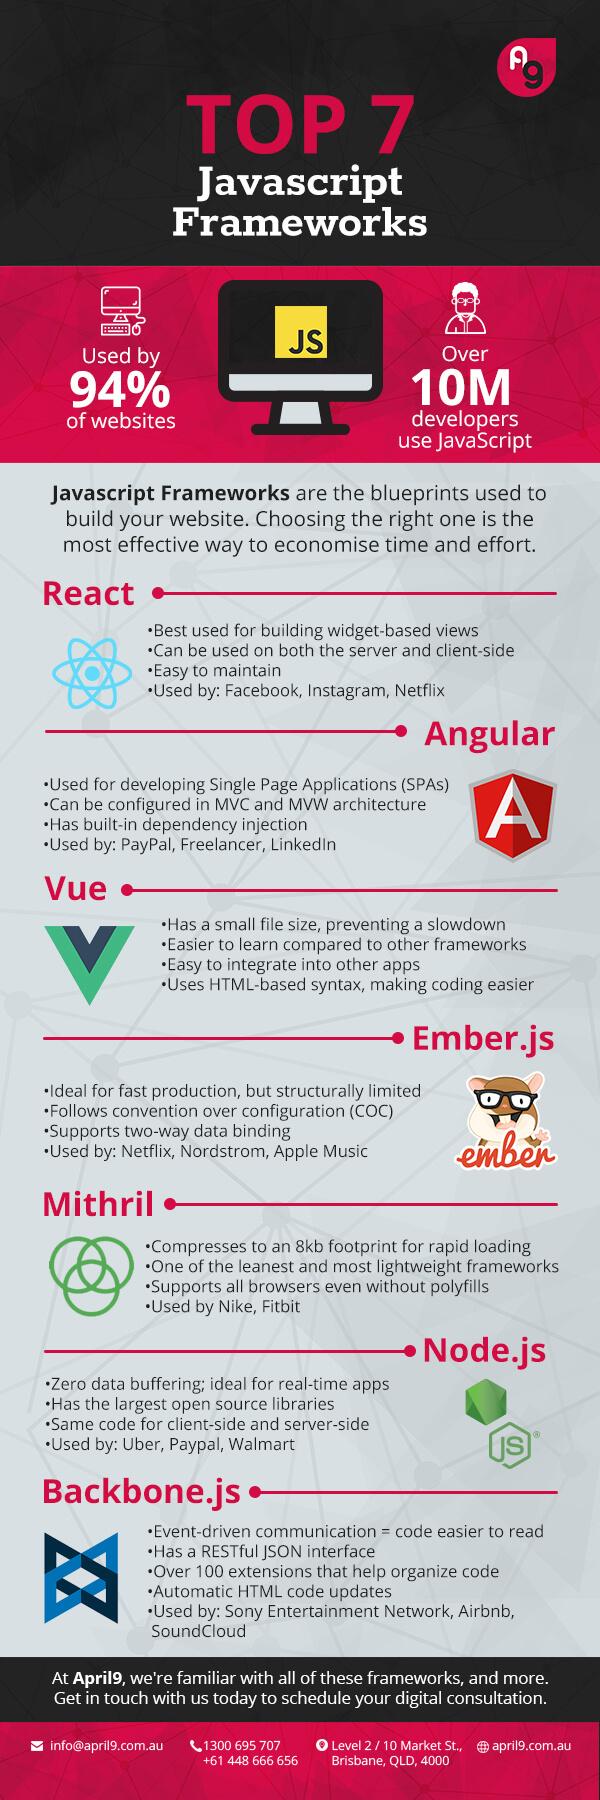 Top 7 JavaScript Frameworks in 2020